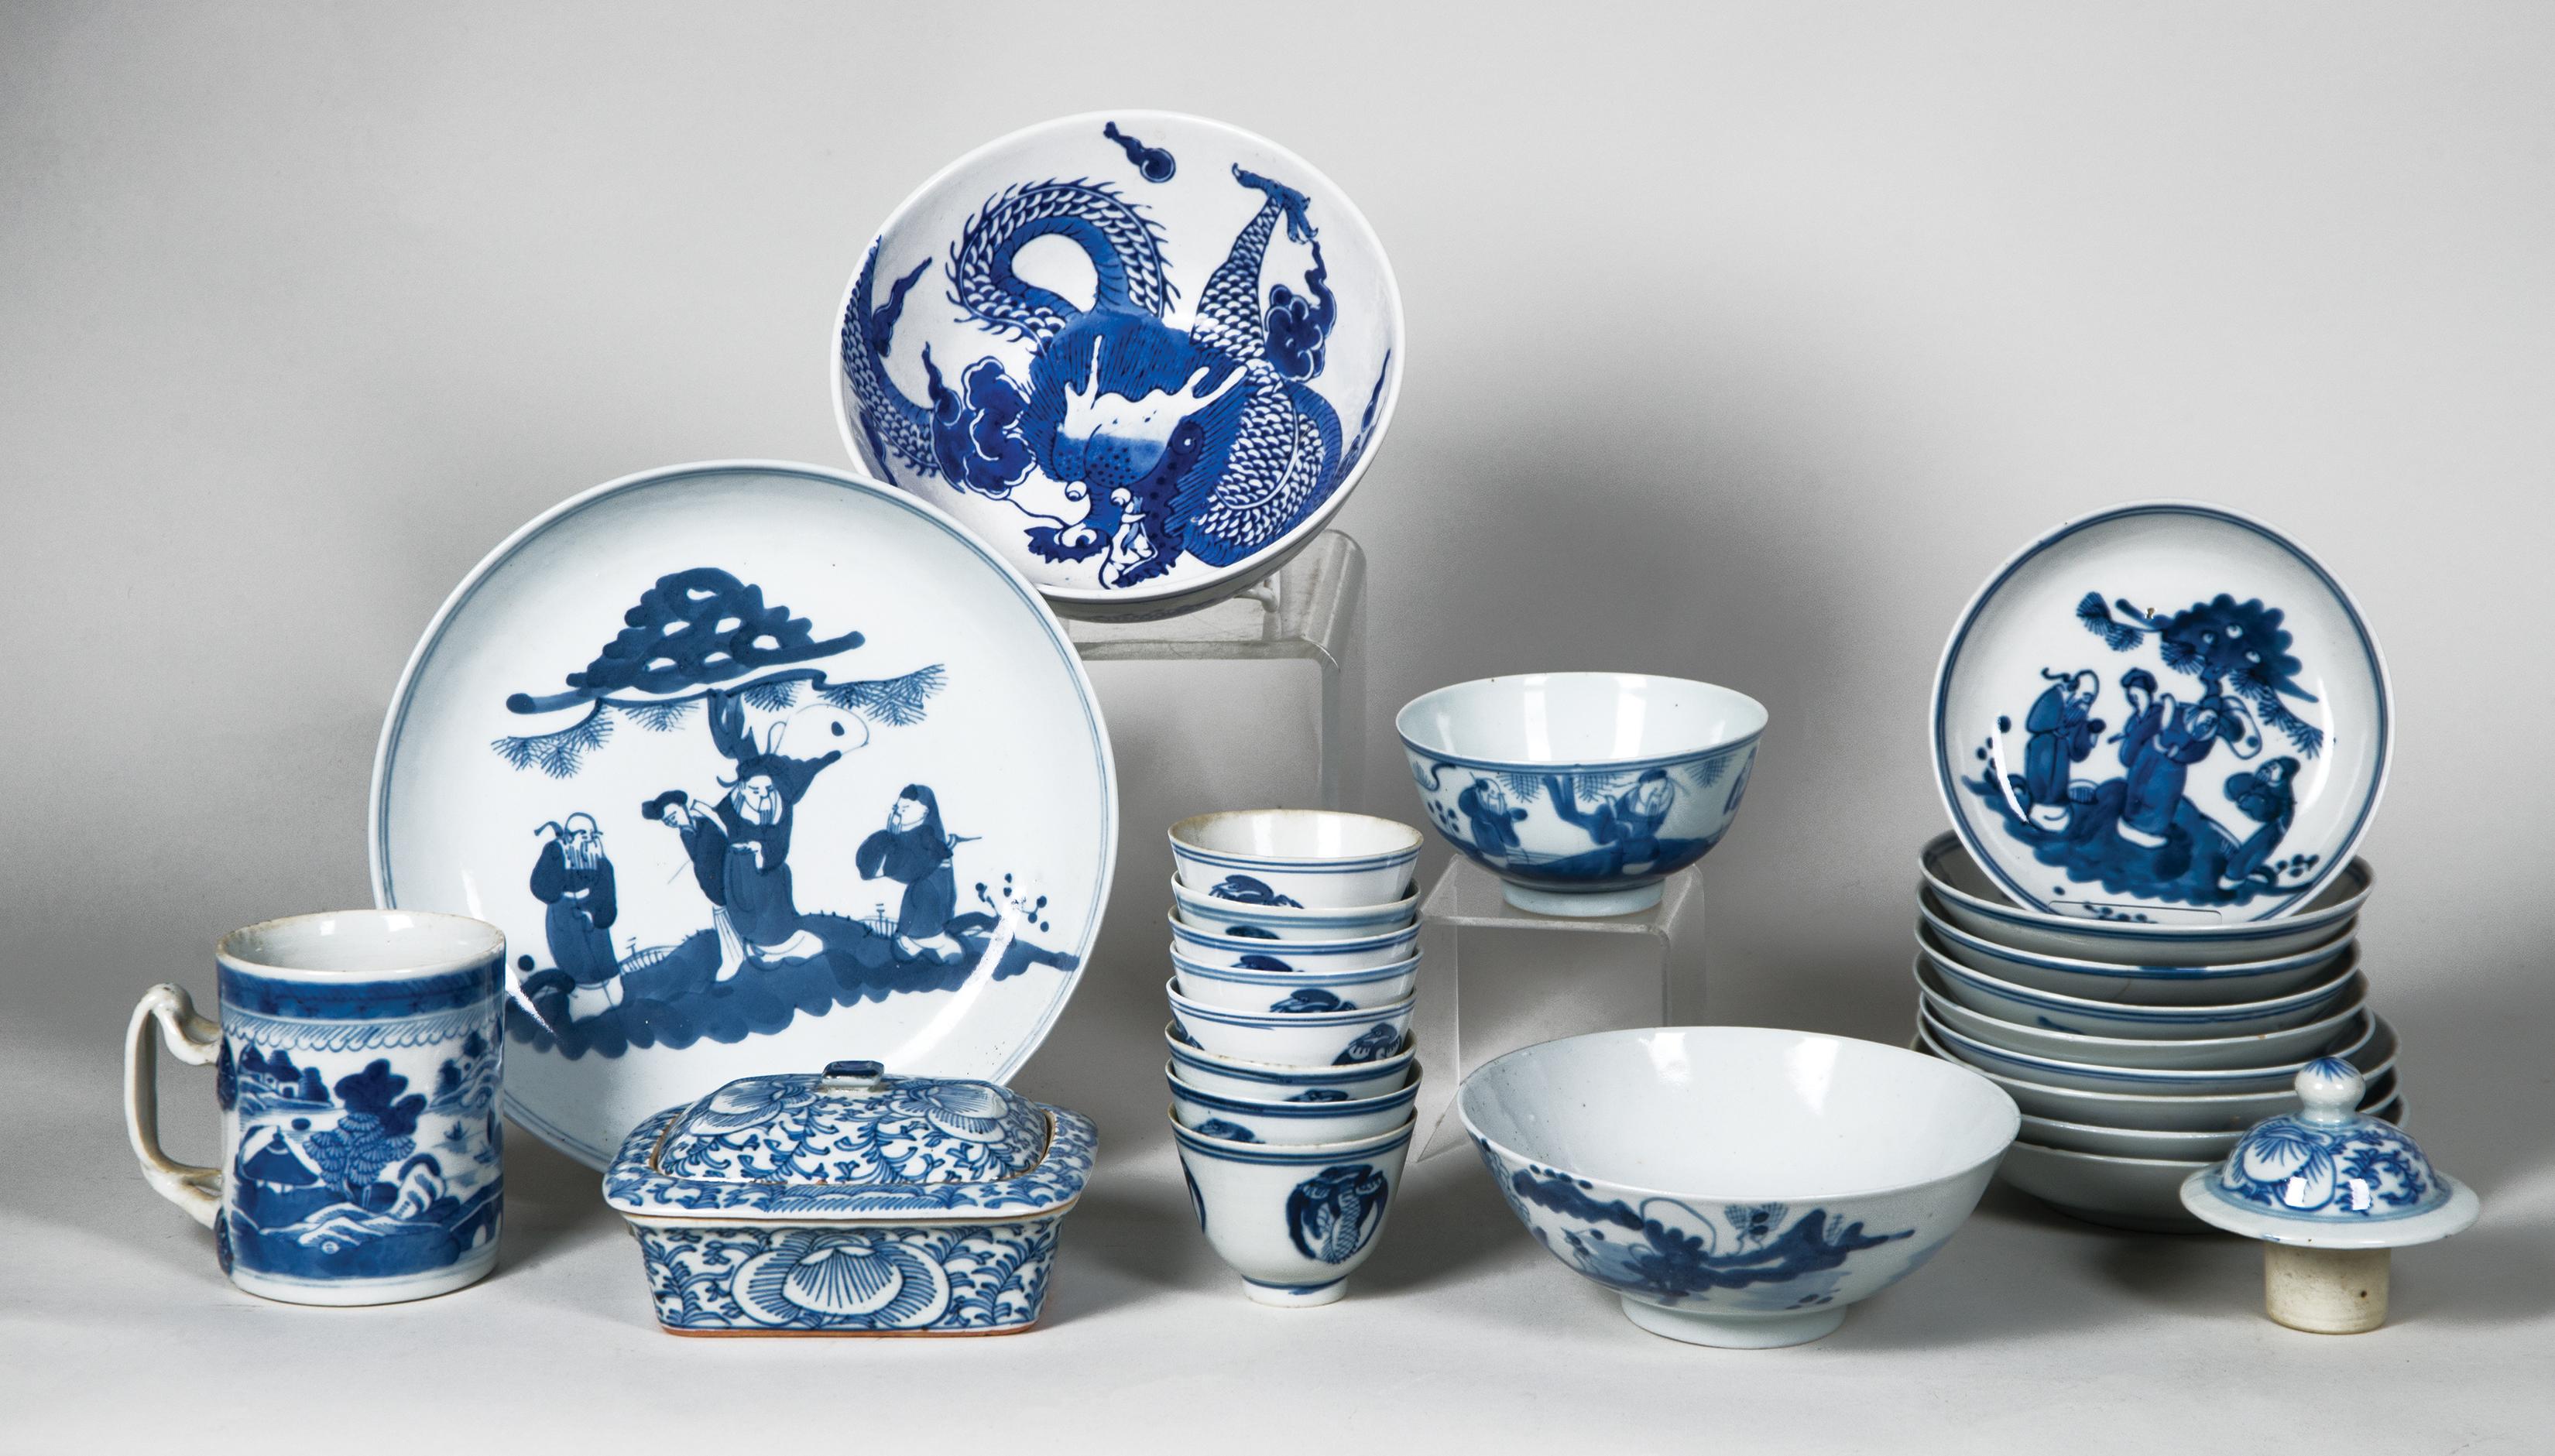 chinese, ceramic, mug, plate, bowl, saucer